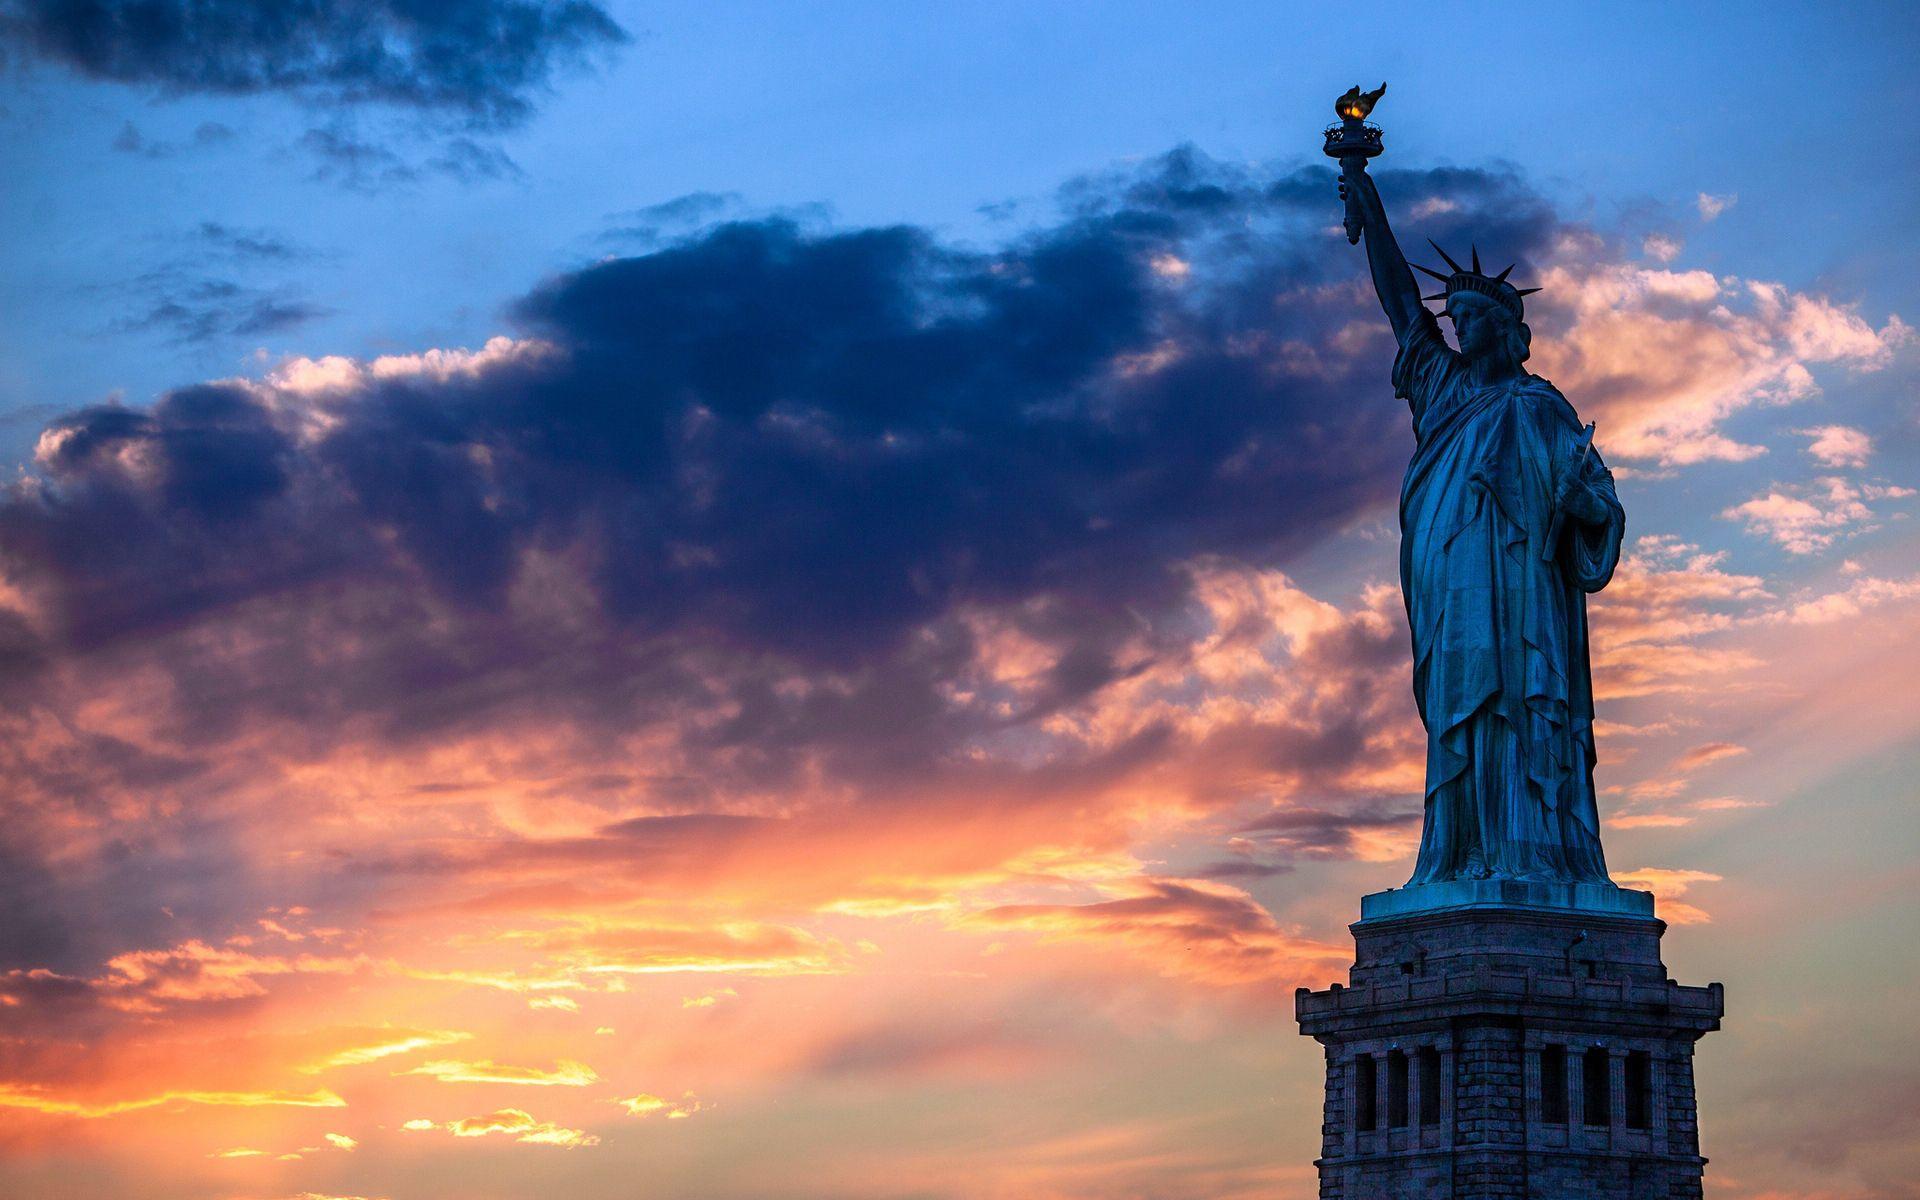 Statue Of Liberty Sunset Wallpaper   Travel HD Wallpapers 1920x1200